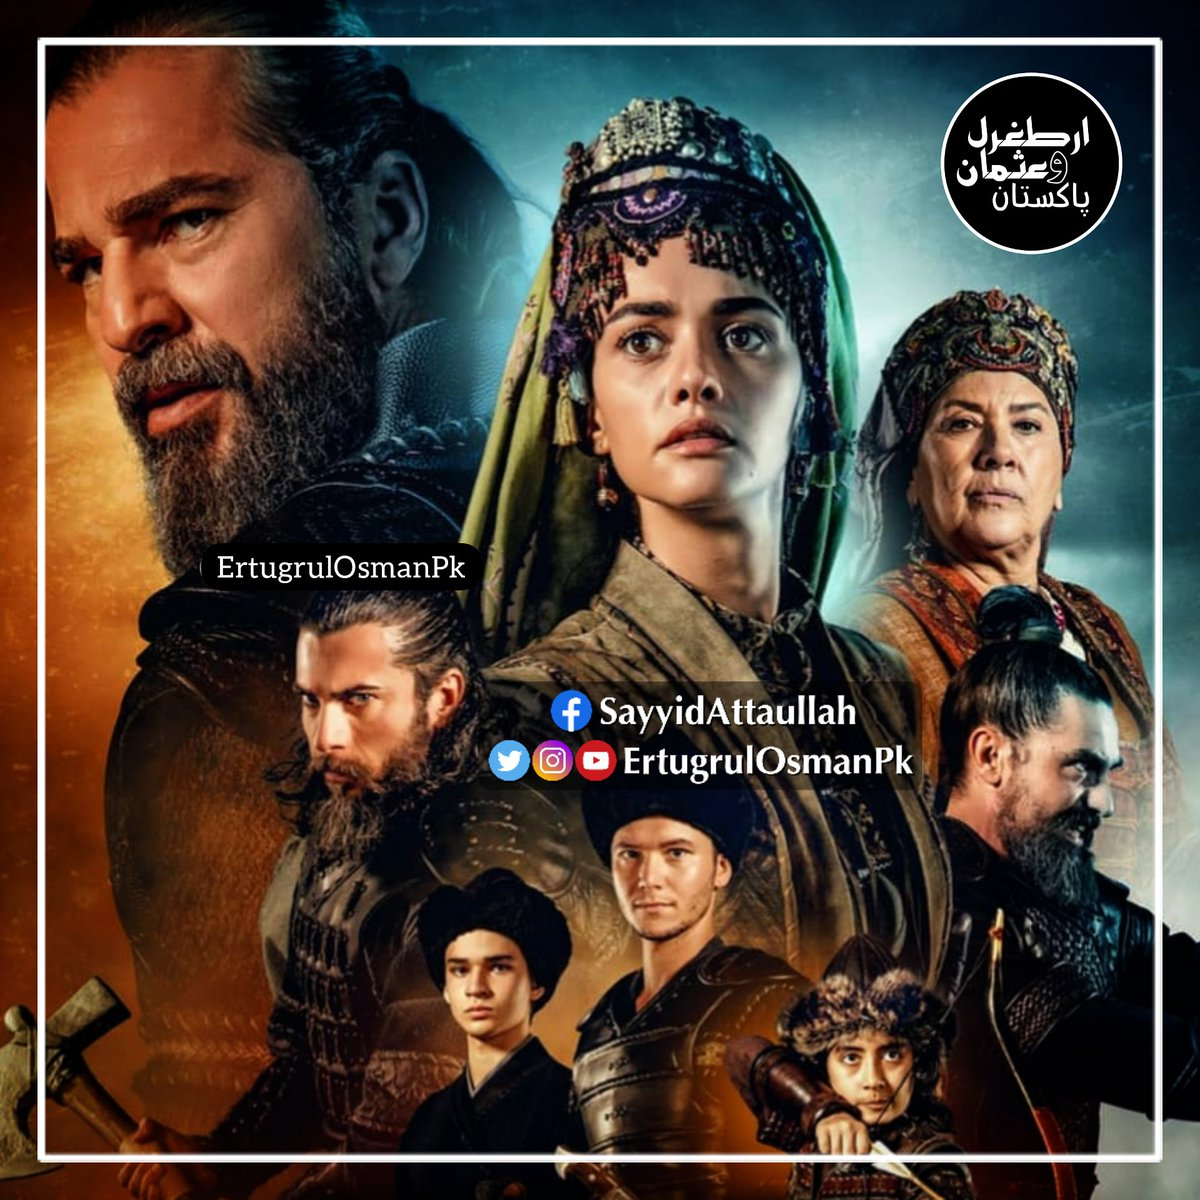 Season 5⃣ Cover 🔥 ❤️ 🔥 #ErtugrulOsmanPakistan  #DirilişErtuğrul #DirilisErtugrul #Ertugrul #ErtugrulUrdu #ErtugrulUrduPTV #ErtugrulUrduPTV_TRT #ErtugrulGhazi #ErtugrulGazi #ErtugrulBey #Bamsi #Turgut #Gunduz #Savci #Osman #Iblige #Kayi #IYI #MehmetBozdağ #Erdogan #Turkey https://t.co/OzRM9ugp7U